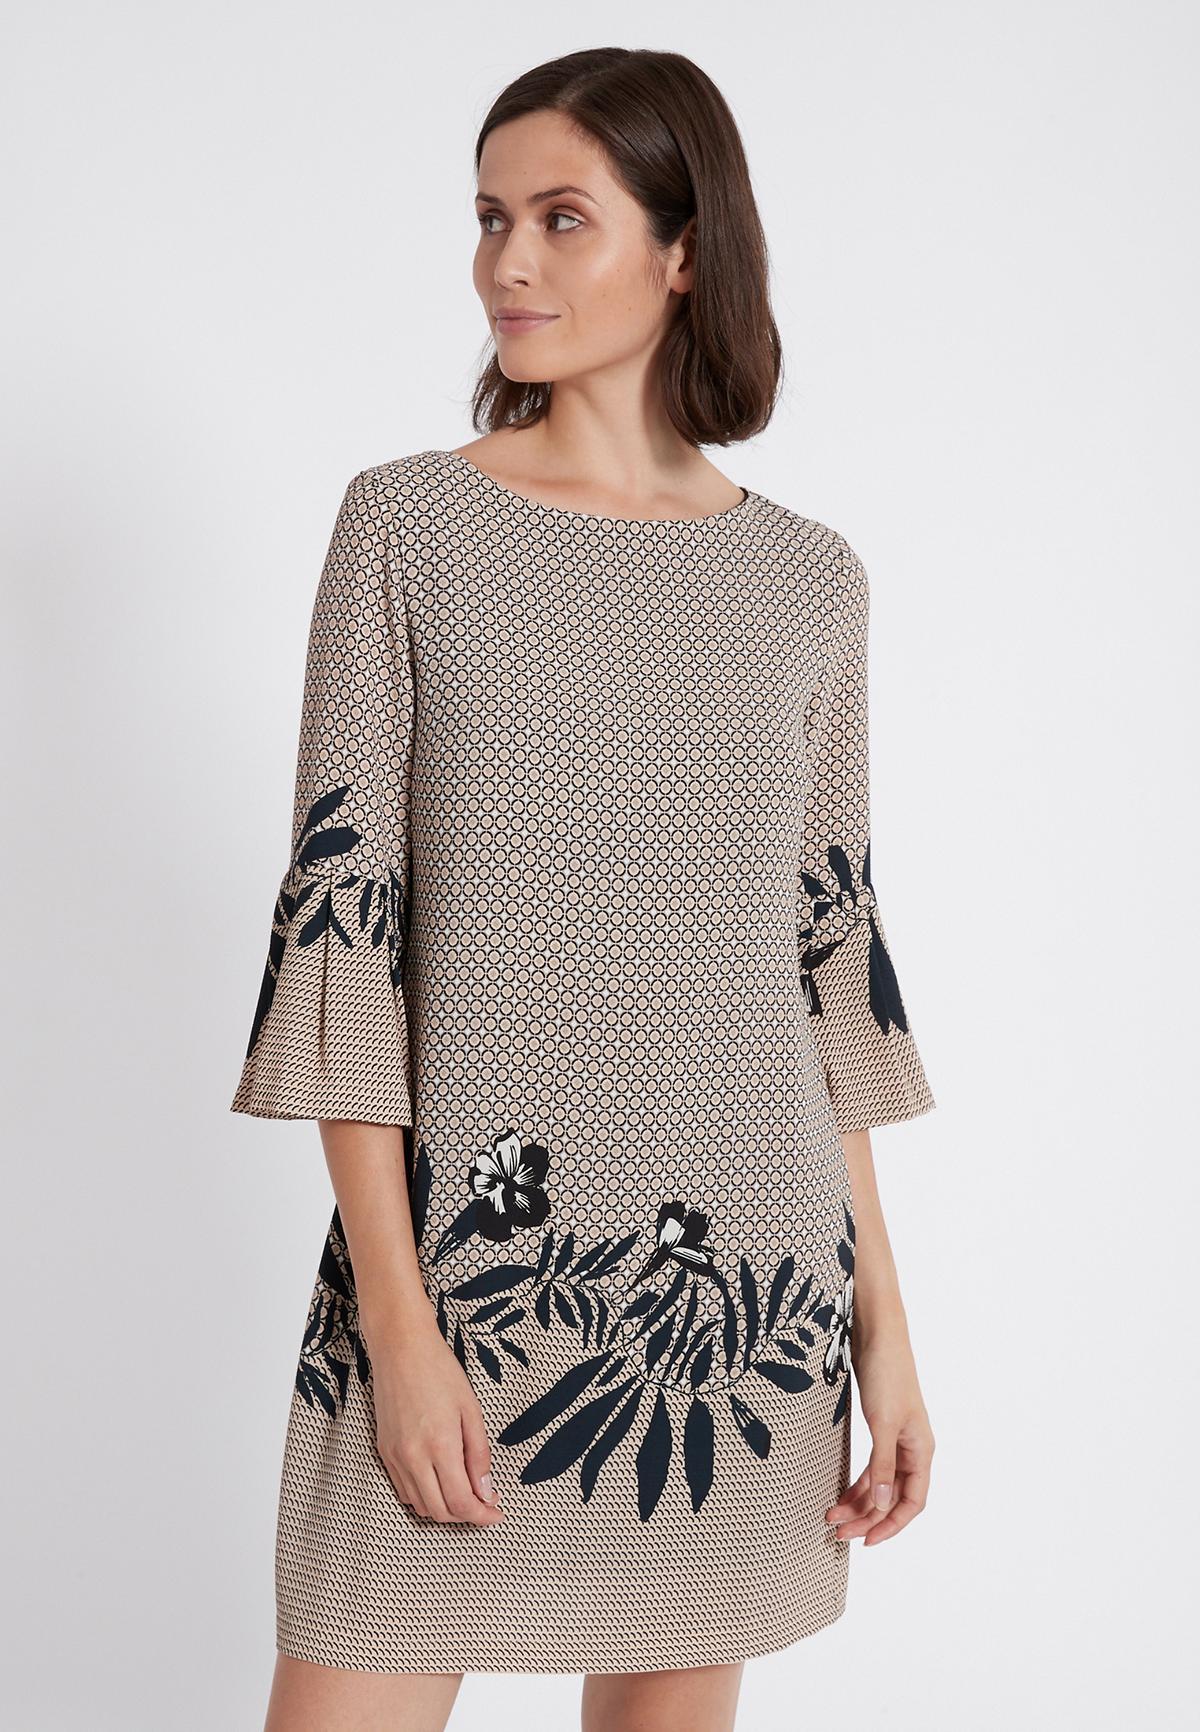 Front of Ana Alcazar Sleeve Dress Serone  worn by model